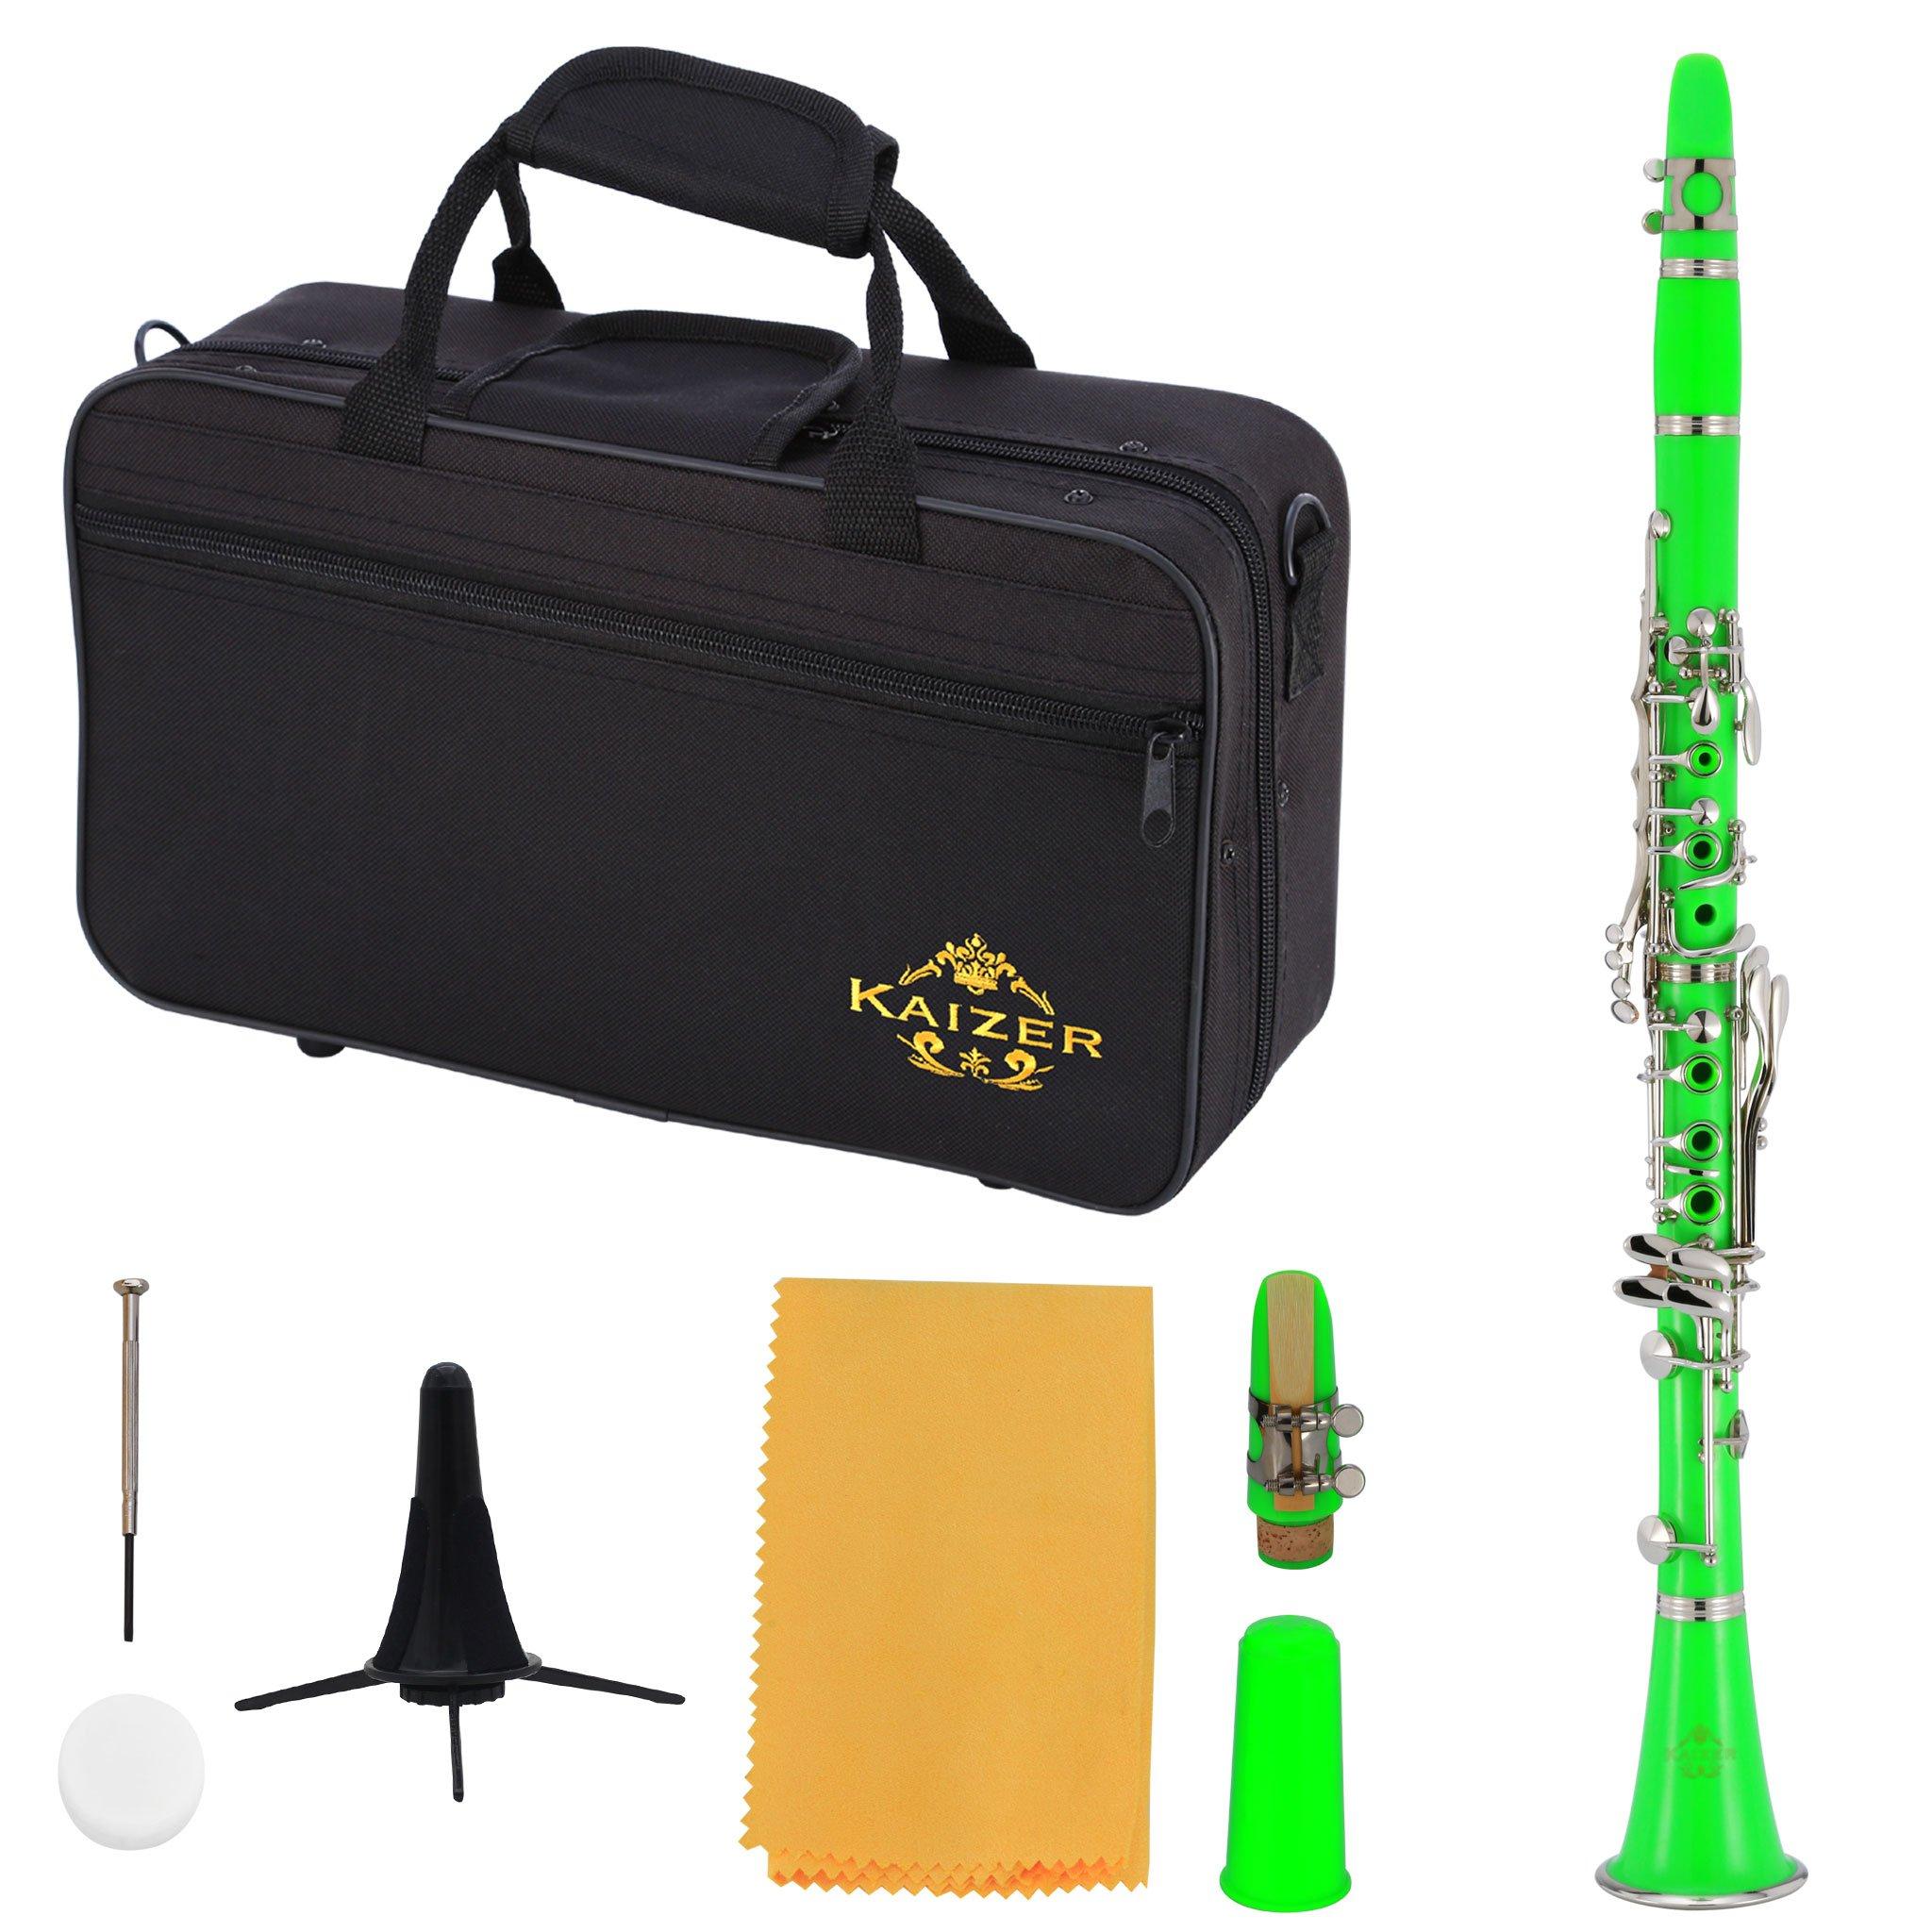 Kaizer Clarinet B Flat Bb Green CLE-1000GR by Kaizer